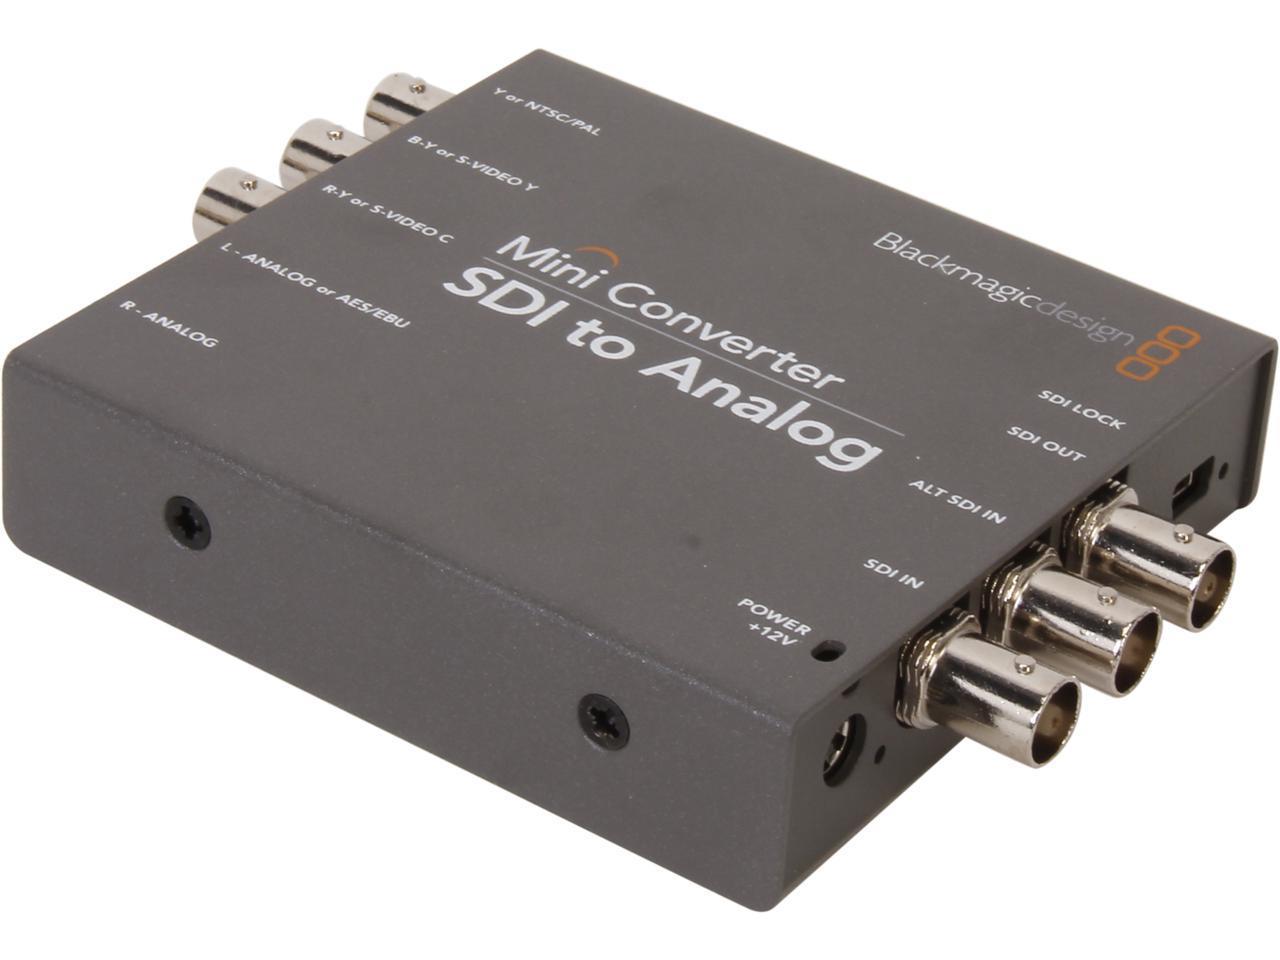 Blackmagic Design Mini Converter Sdi To Analog Convmasa Newegg Com